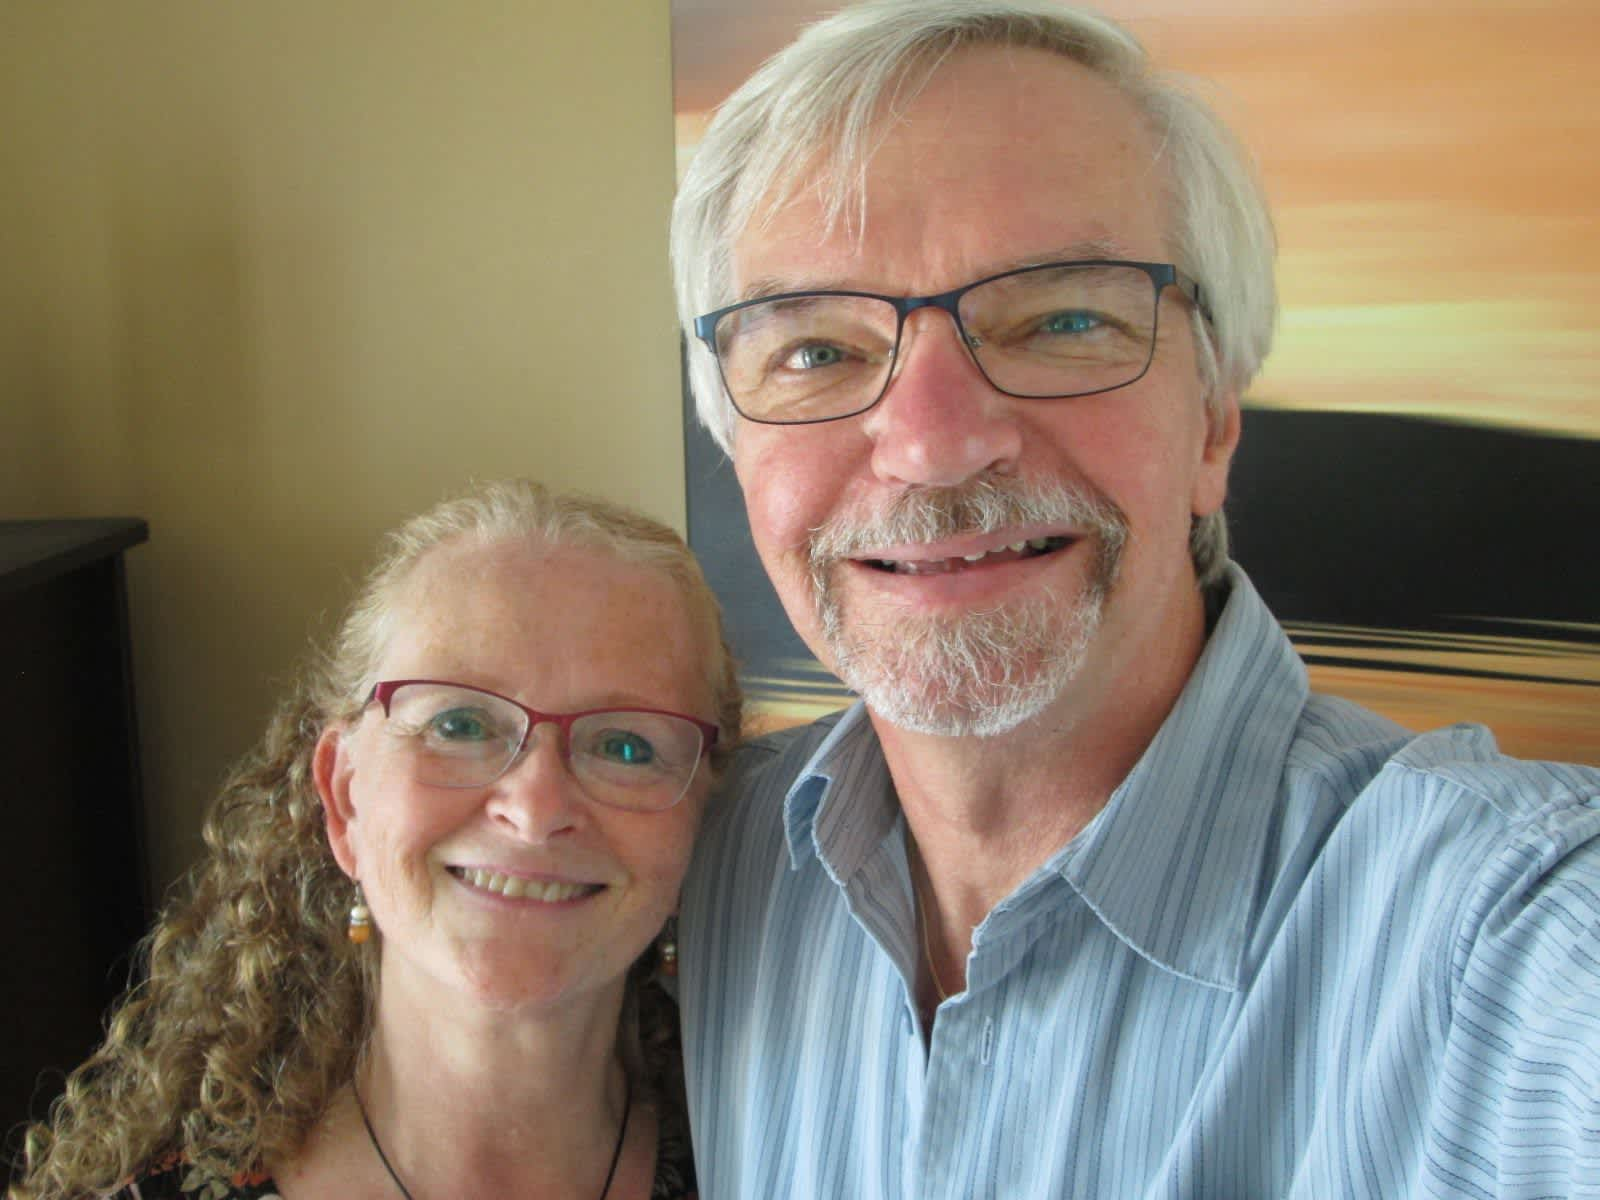 Carol & Lawrence from Halifax, Nova Scotia, Canada